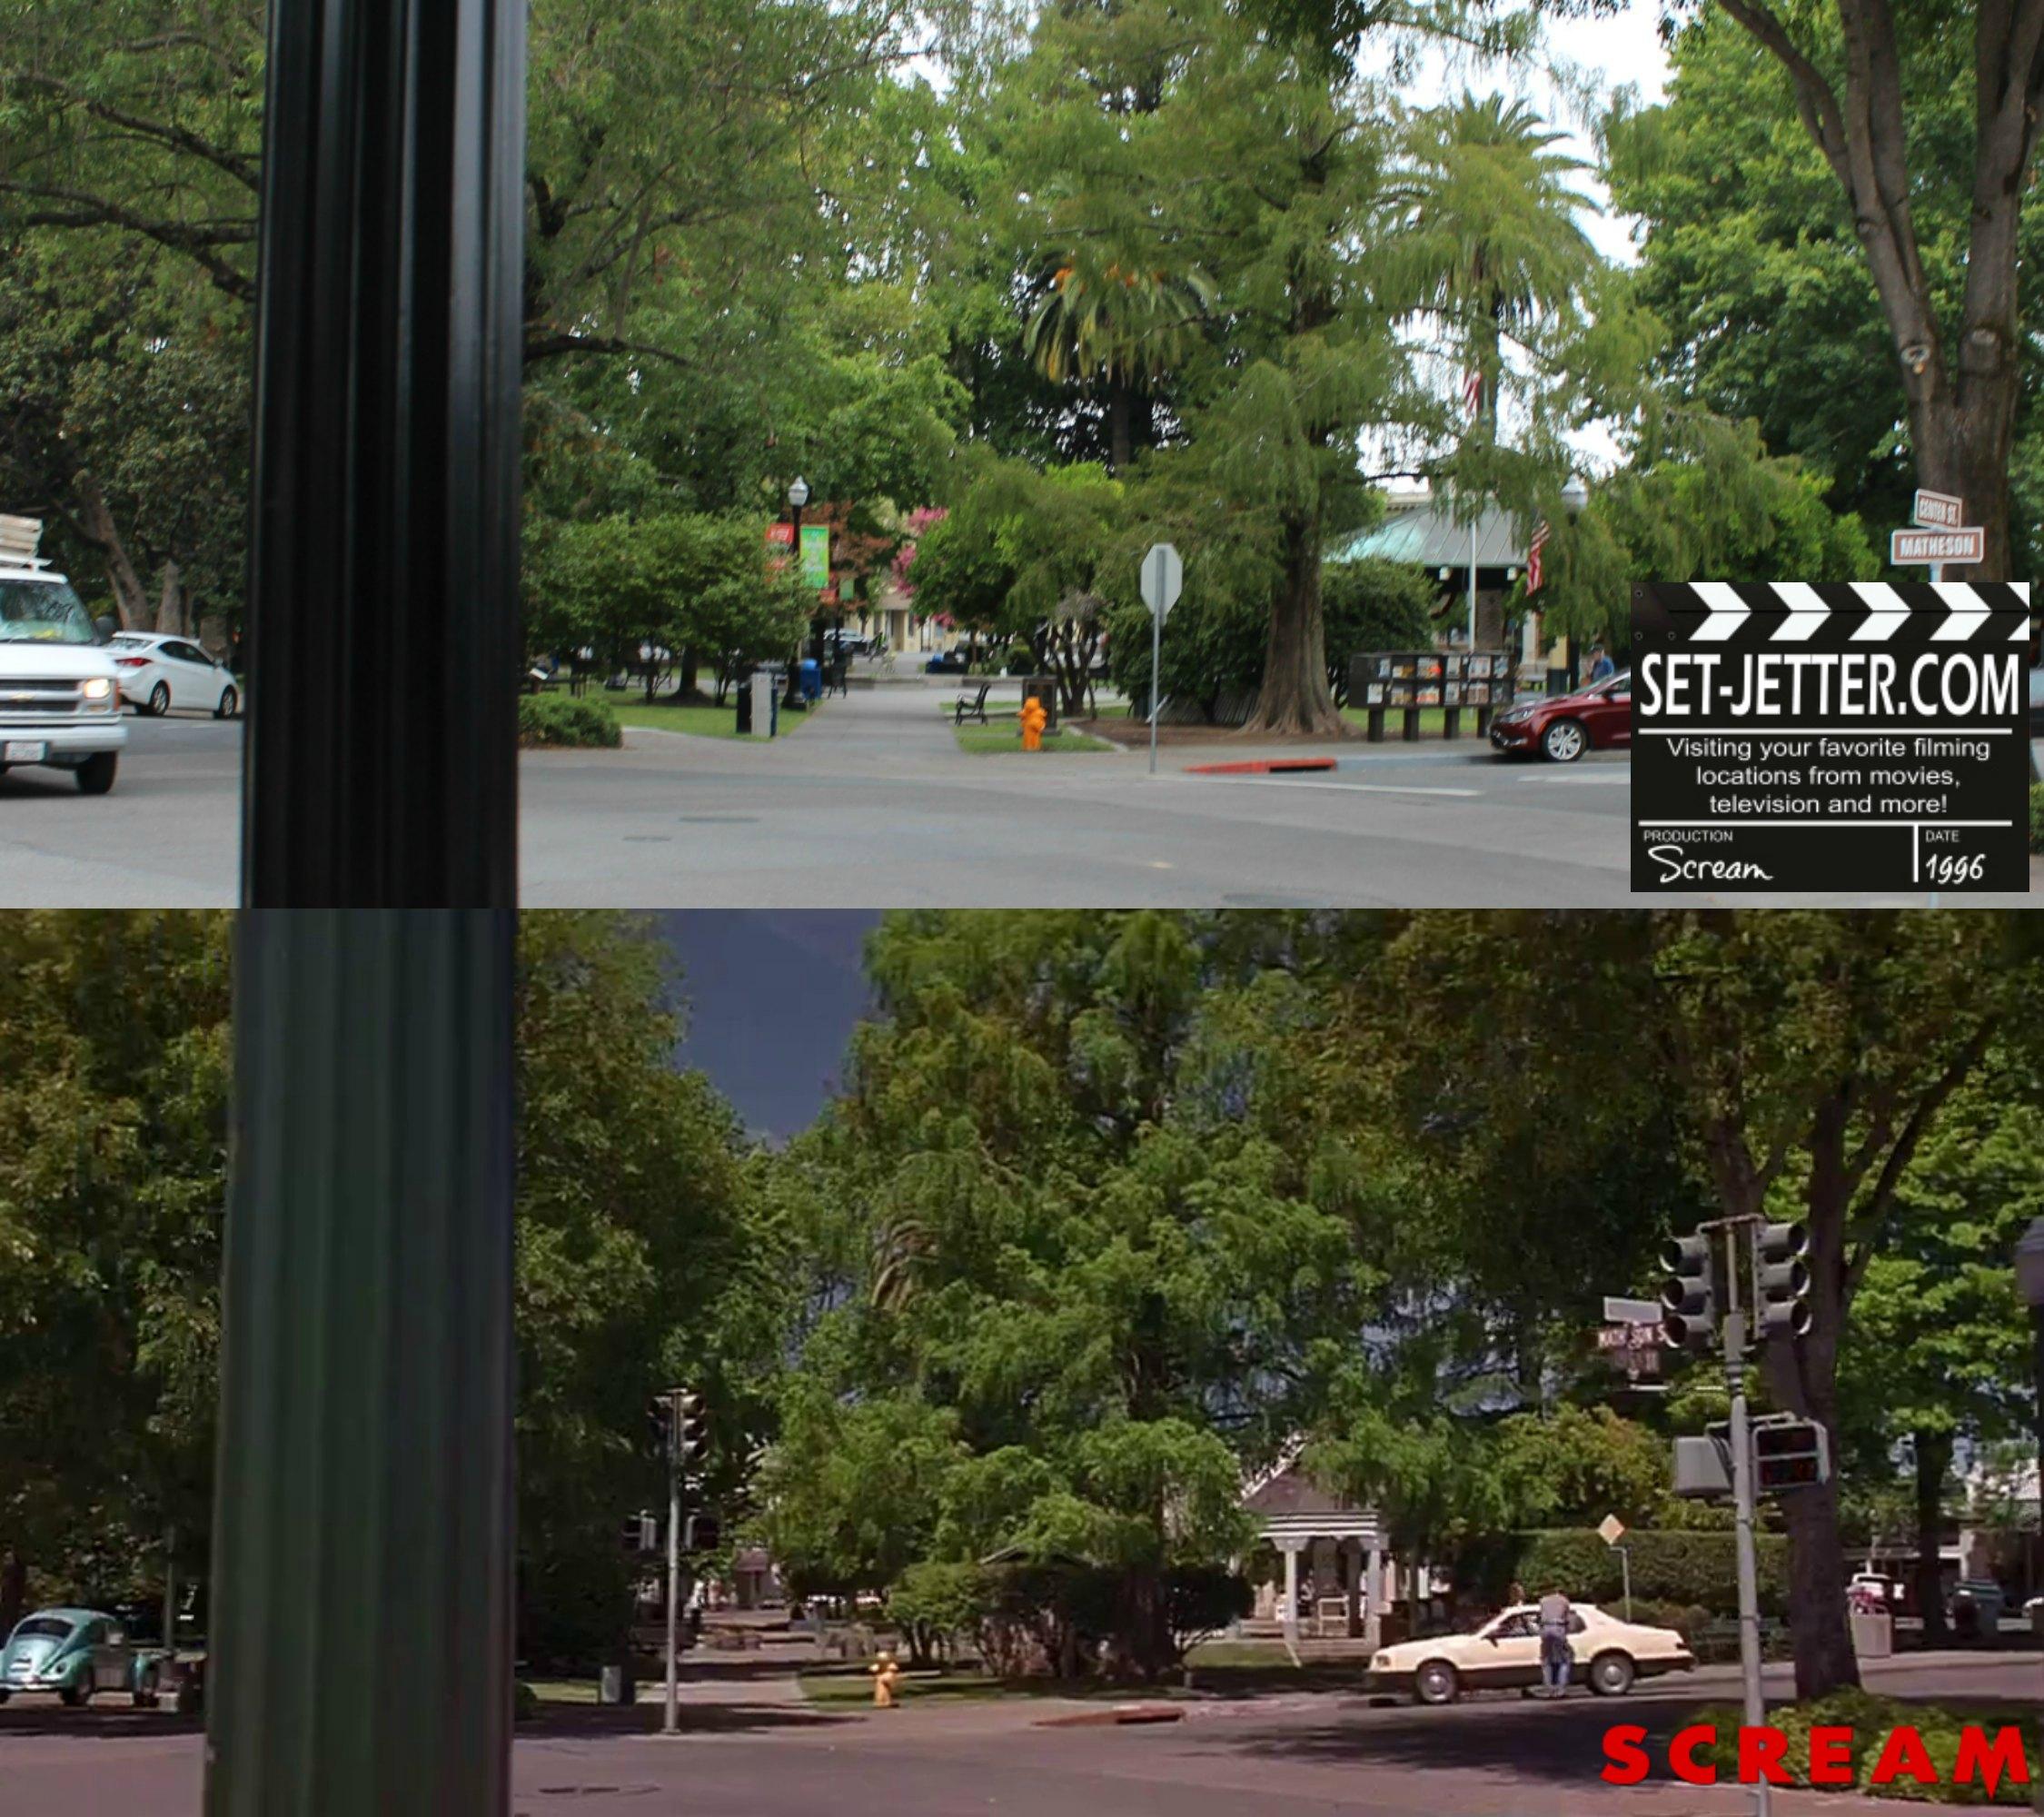 Scream comparison 213.jpg